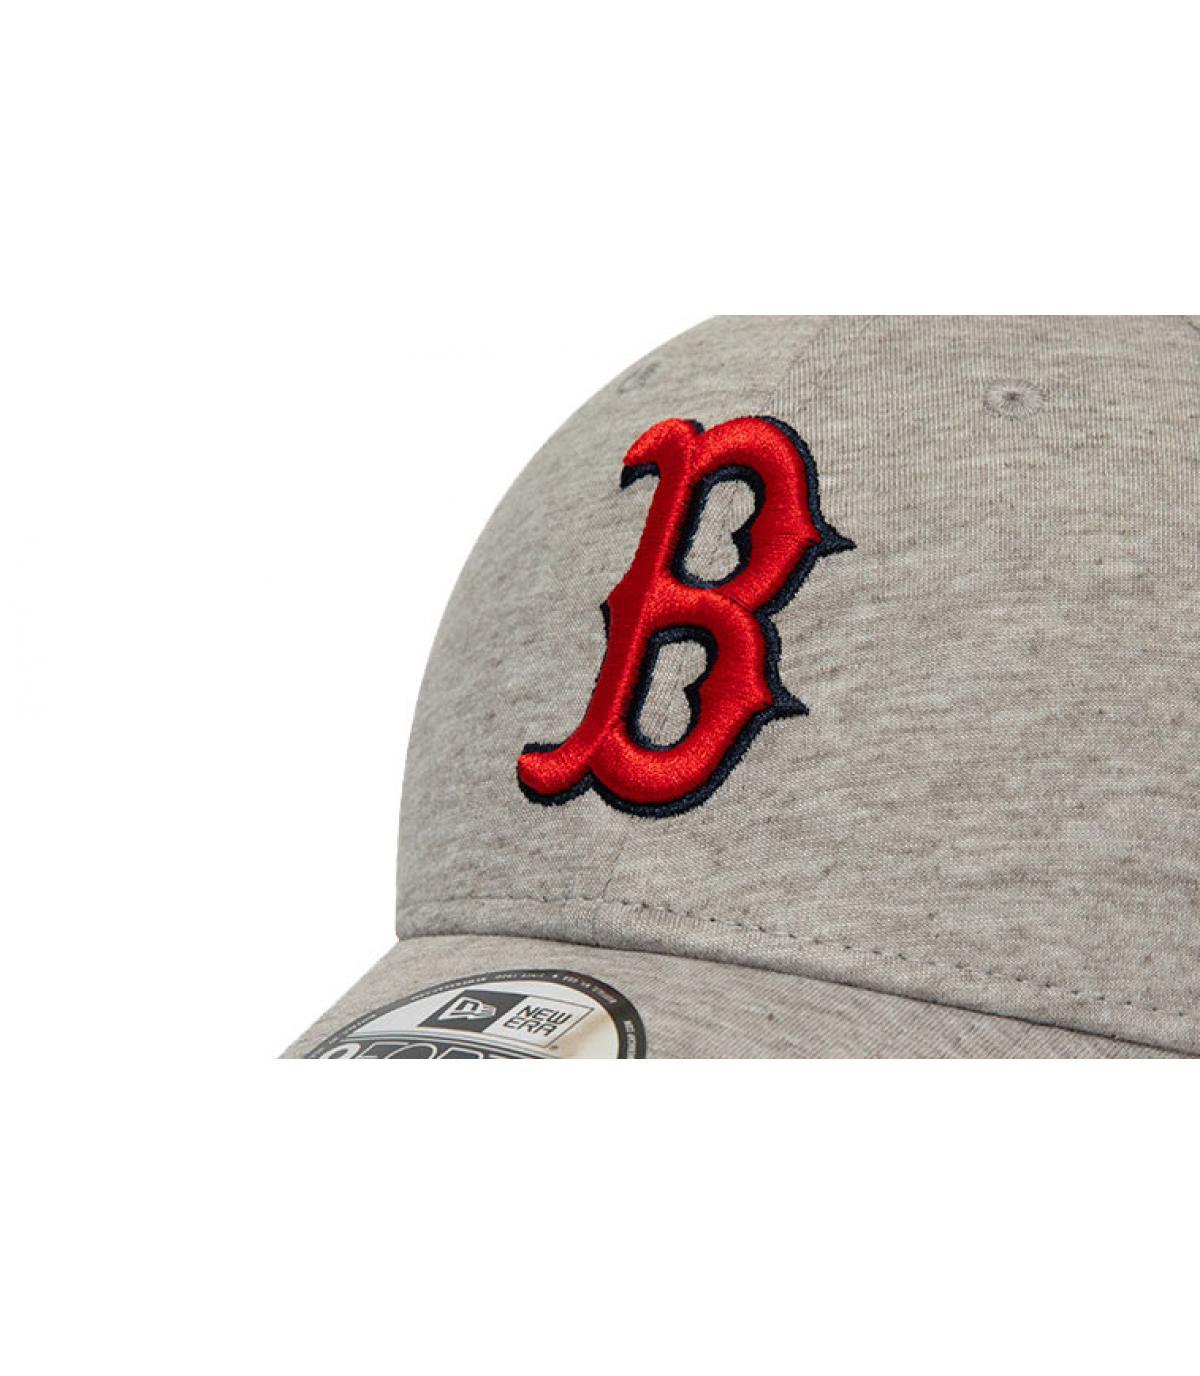 Dettagli Jersey Ess Boston 940 gray - image 3